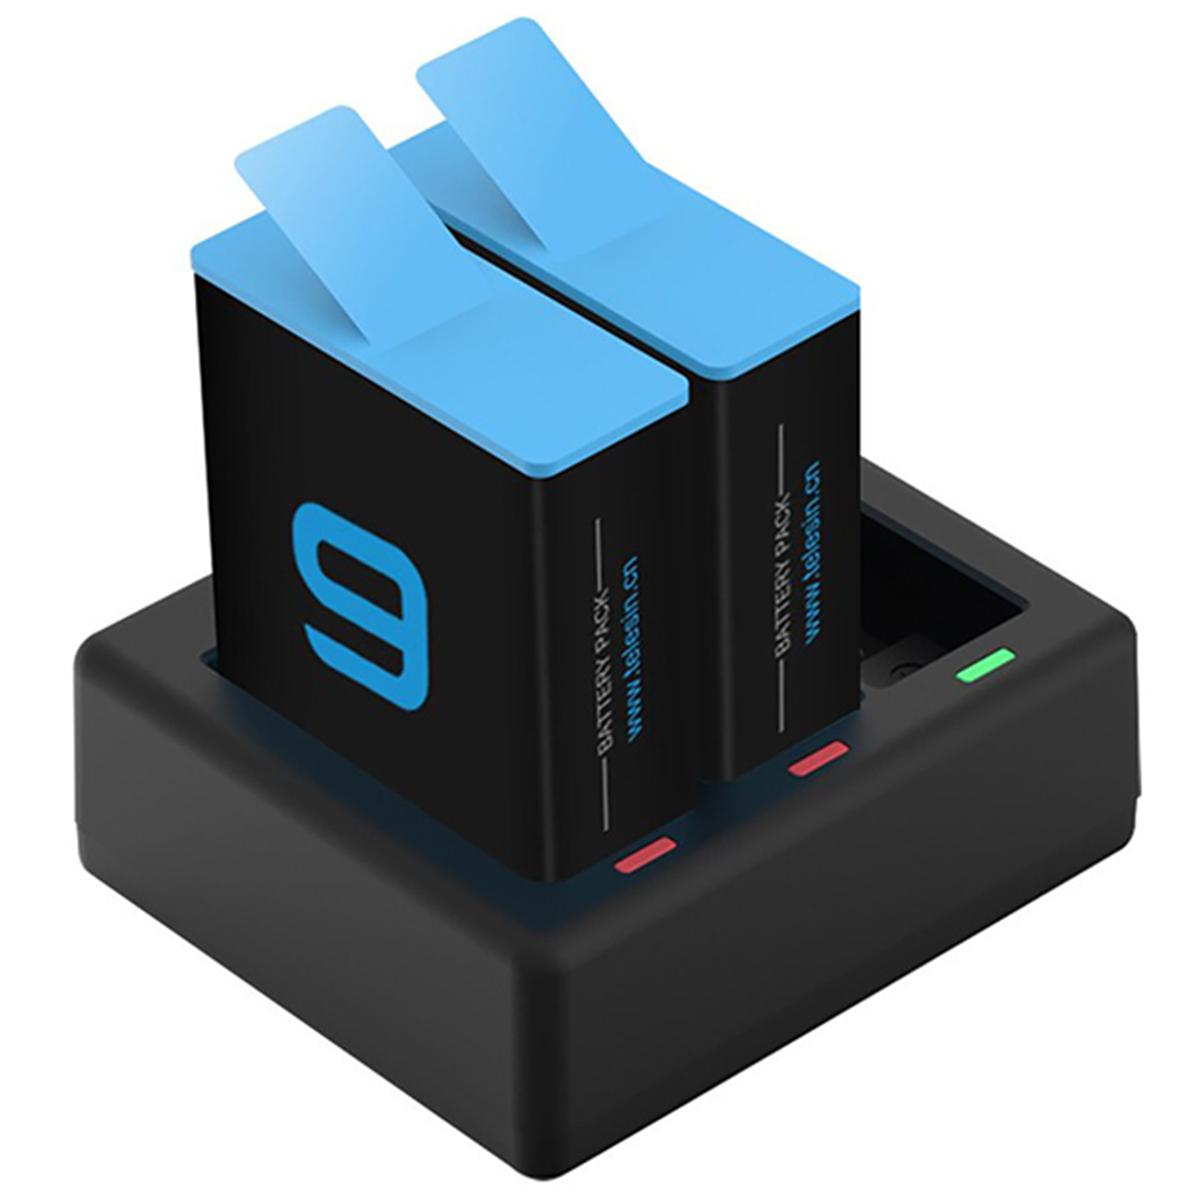 Carregador Triplo com 2 Baterias - GoPro Hero 9 Black - Telesin